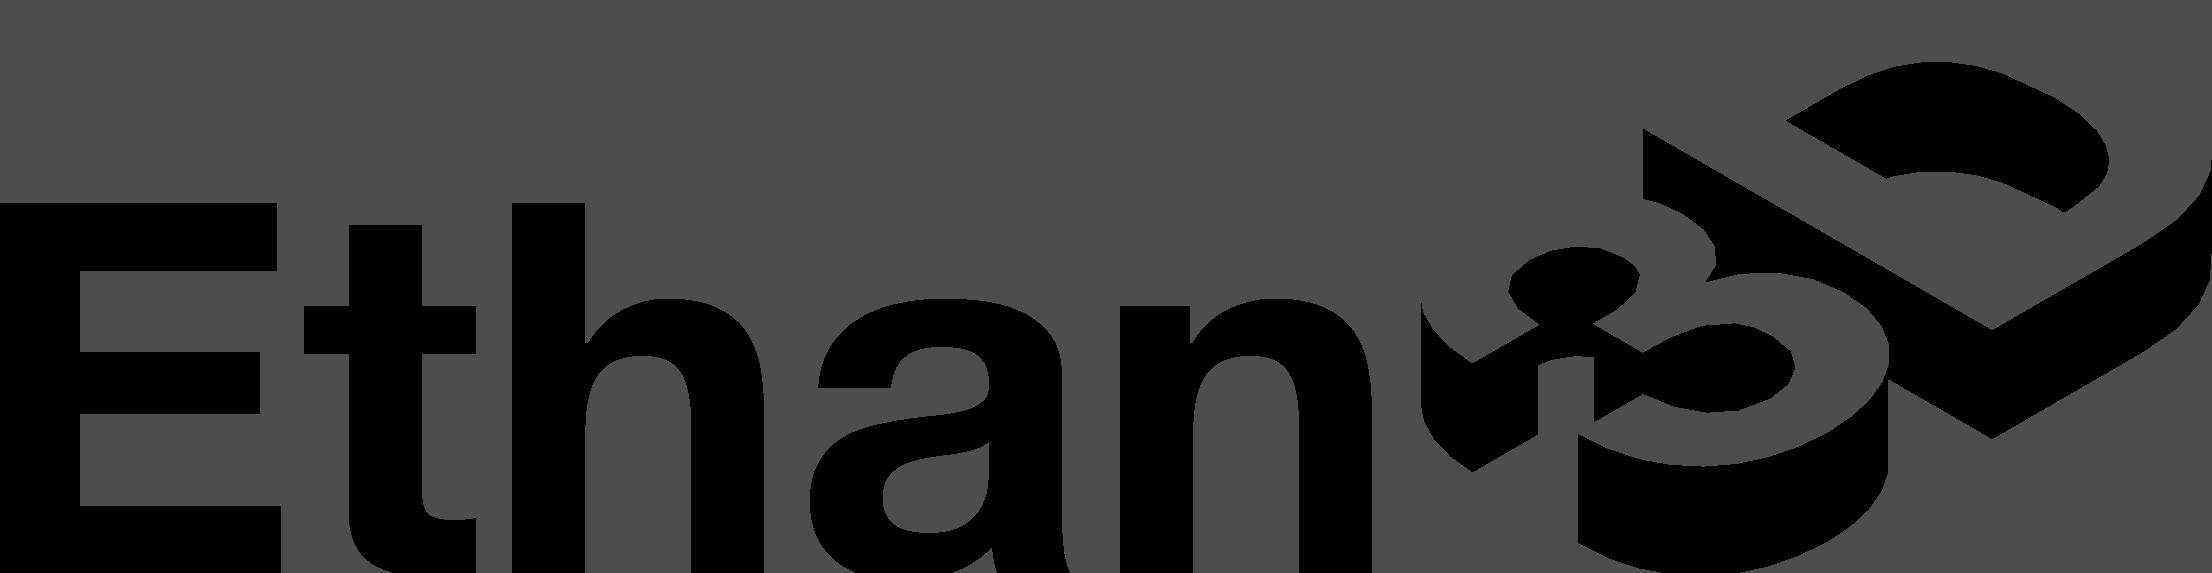 ETHAN3D Logo (drkgrey)-01.png